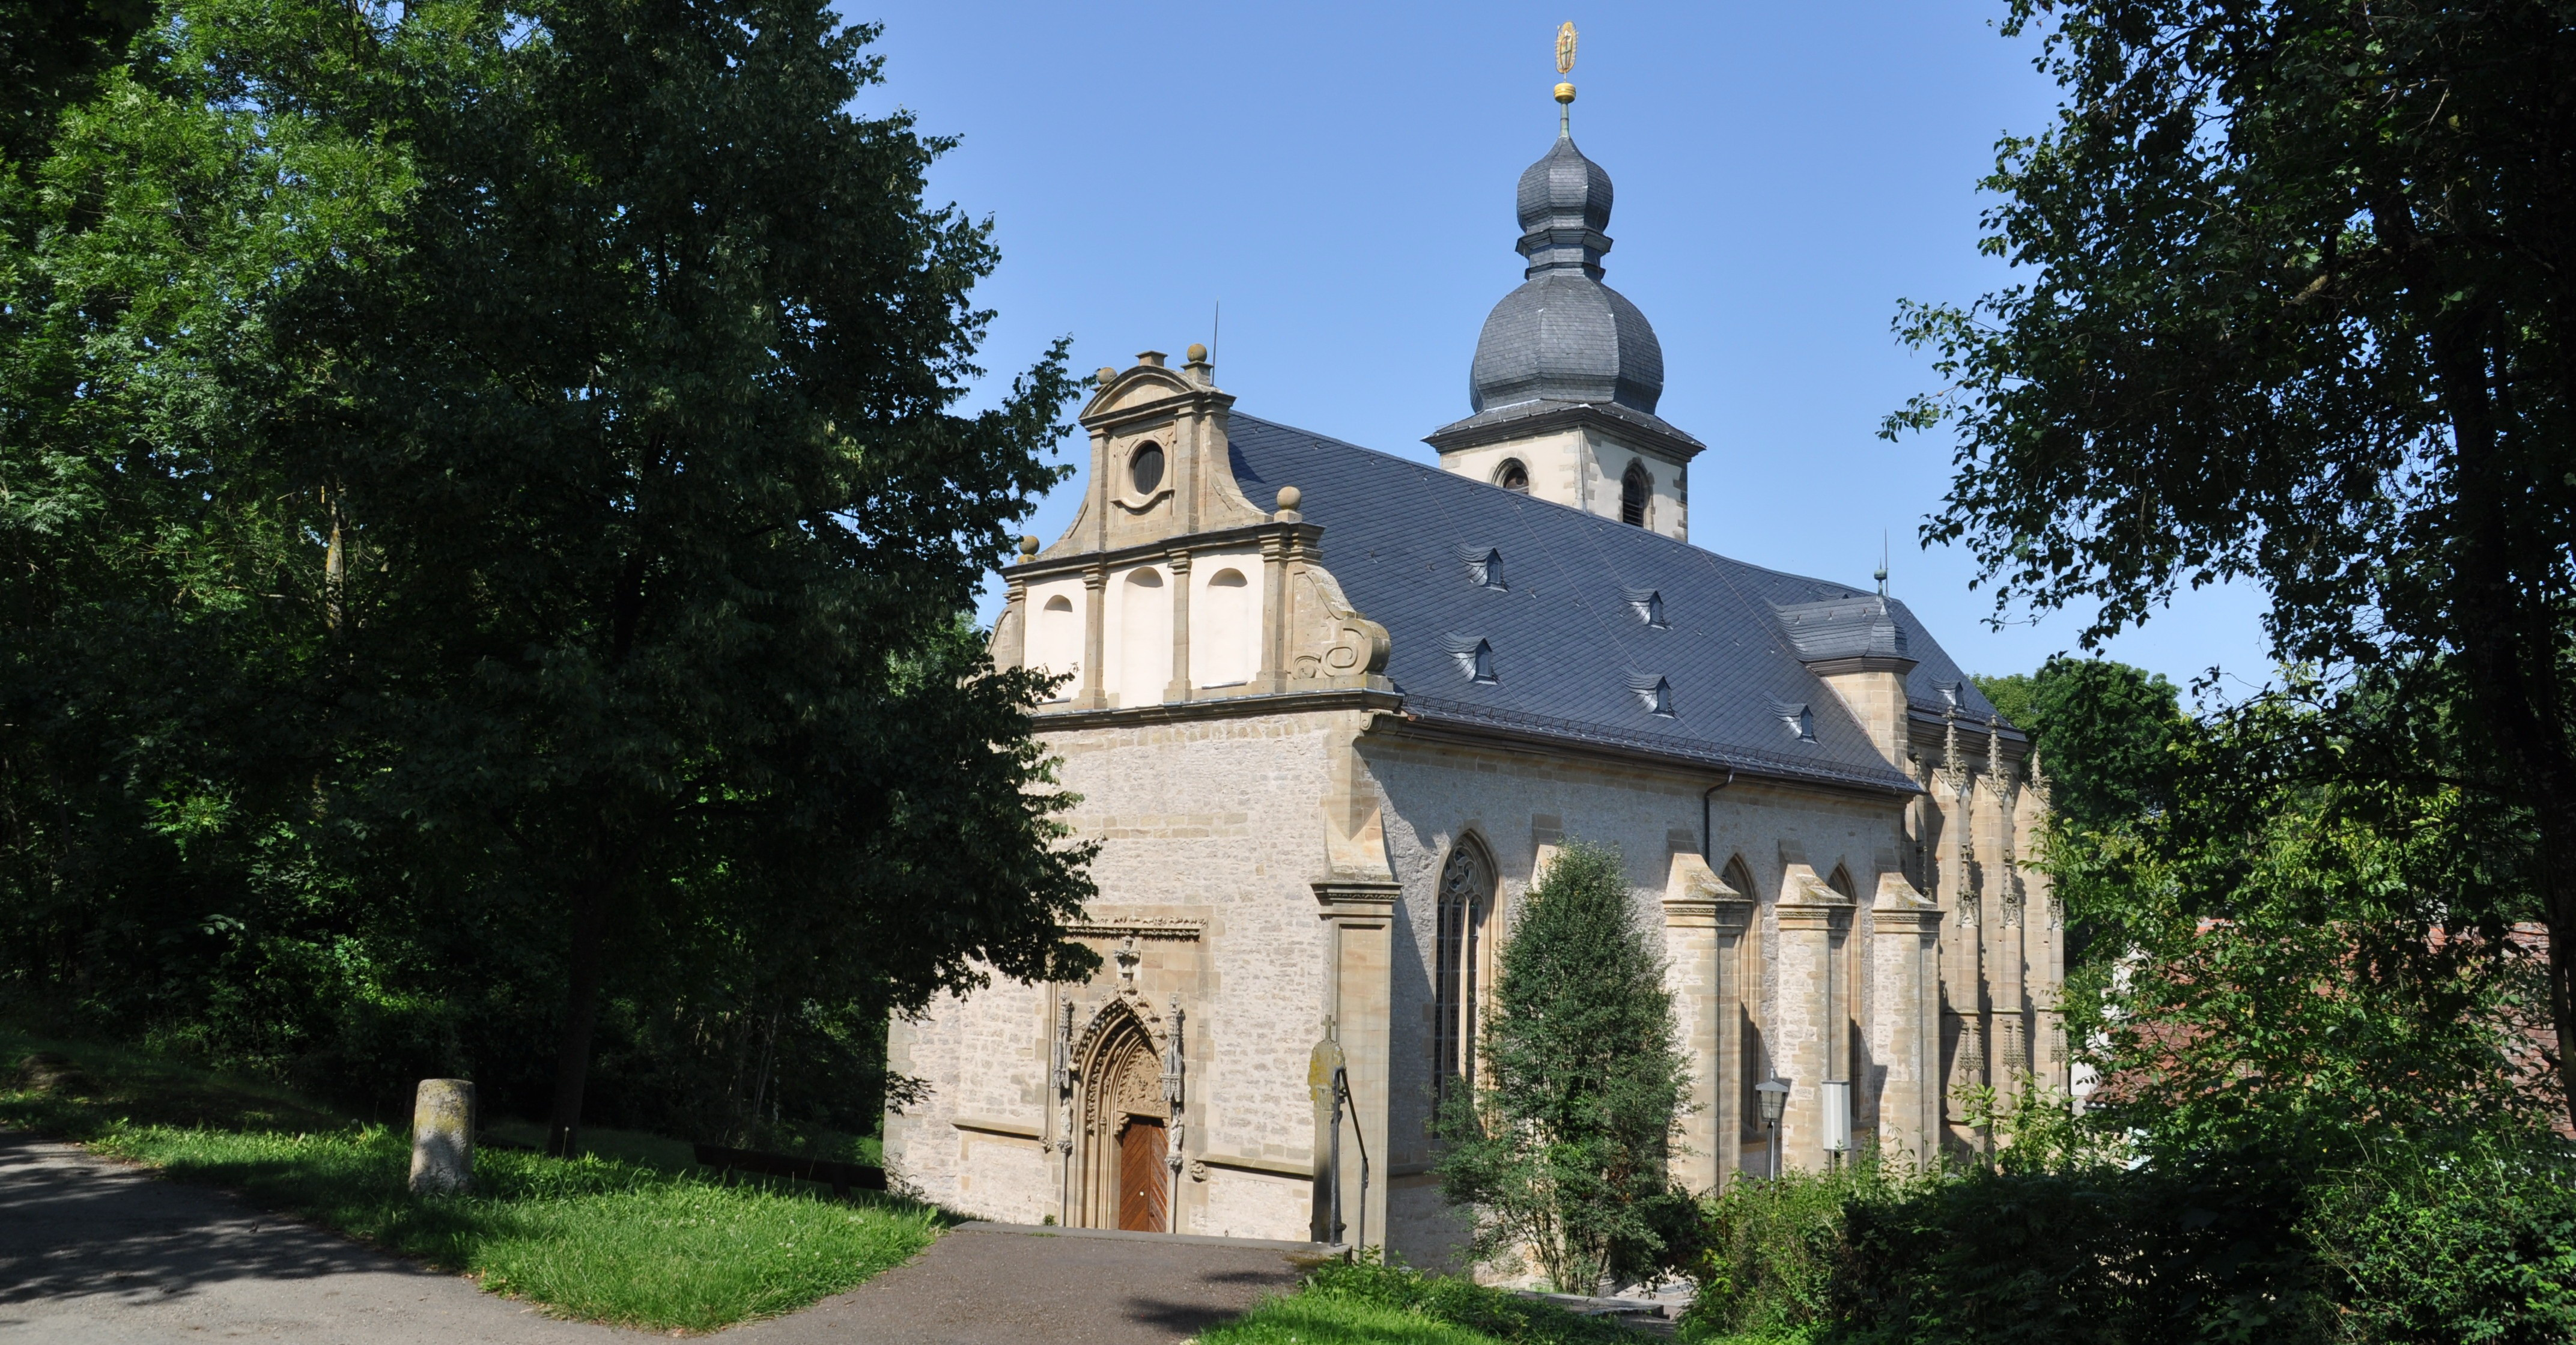 katholische kirche uhingen